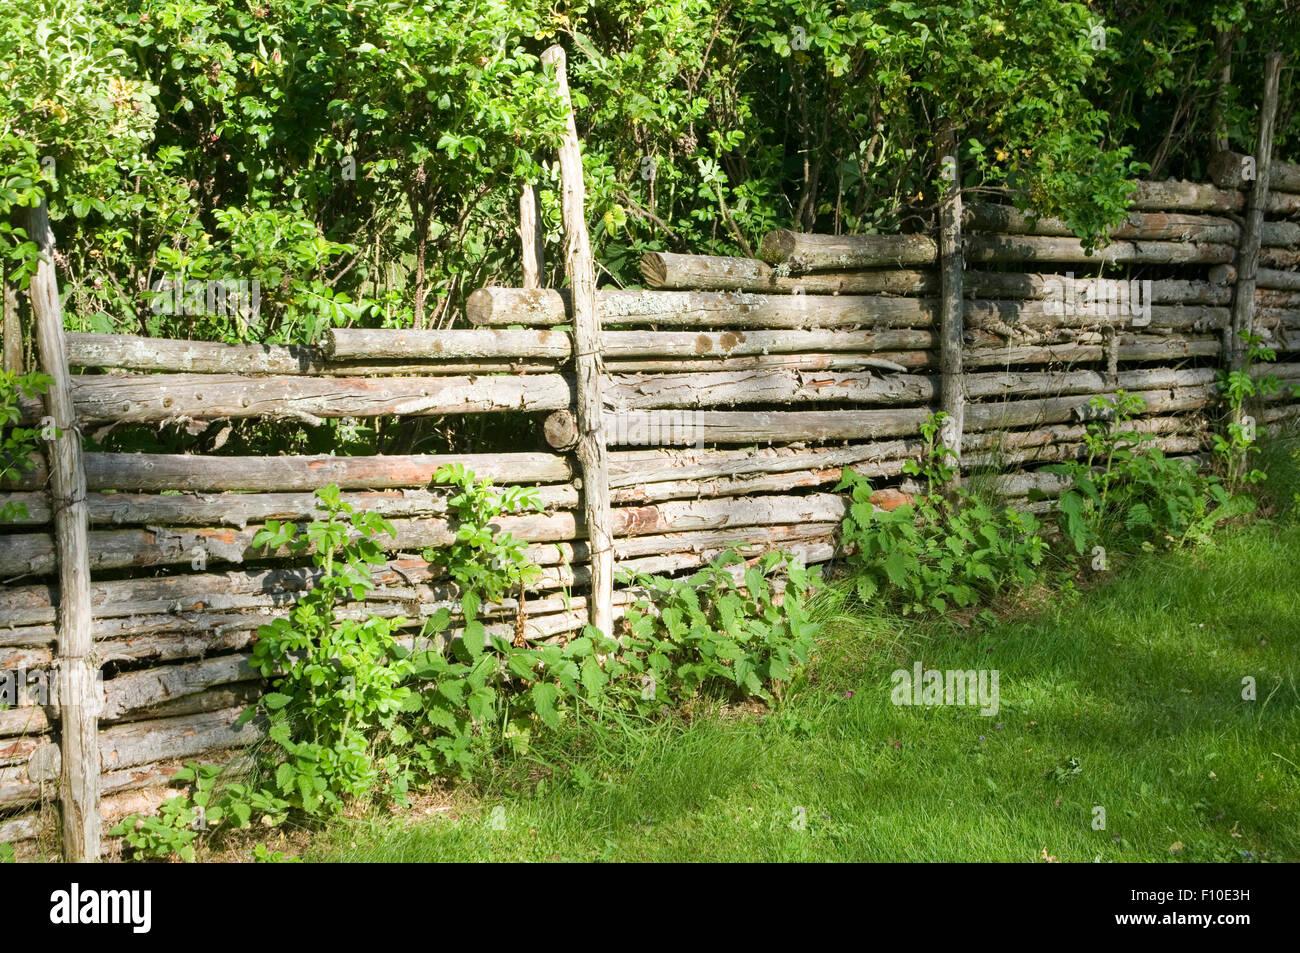 traditional roundpole swedish fence fences fencing sweden countryside round polesweden Scandinavia Scandinavian - Stock Image